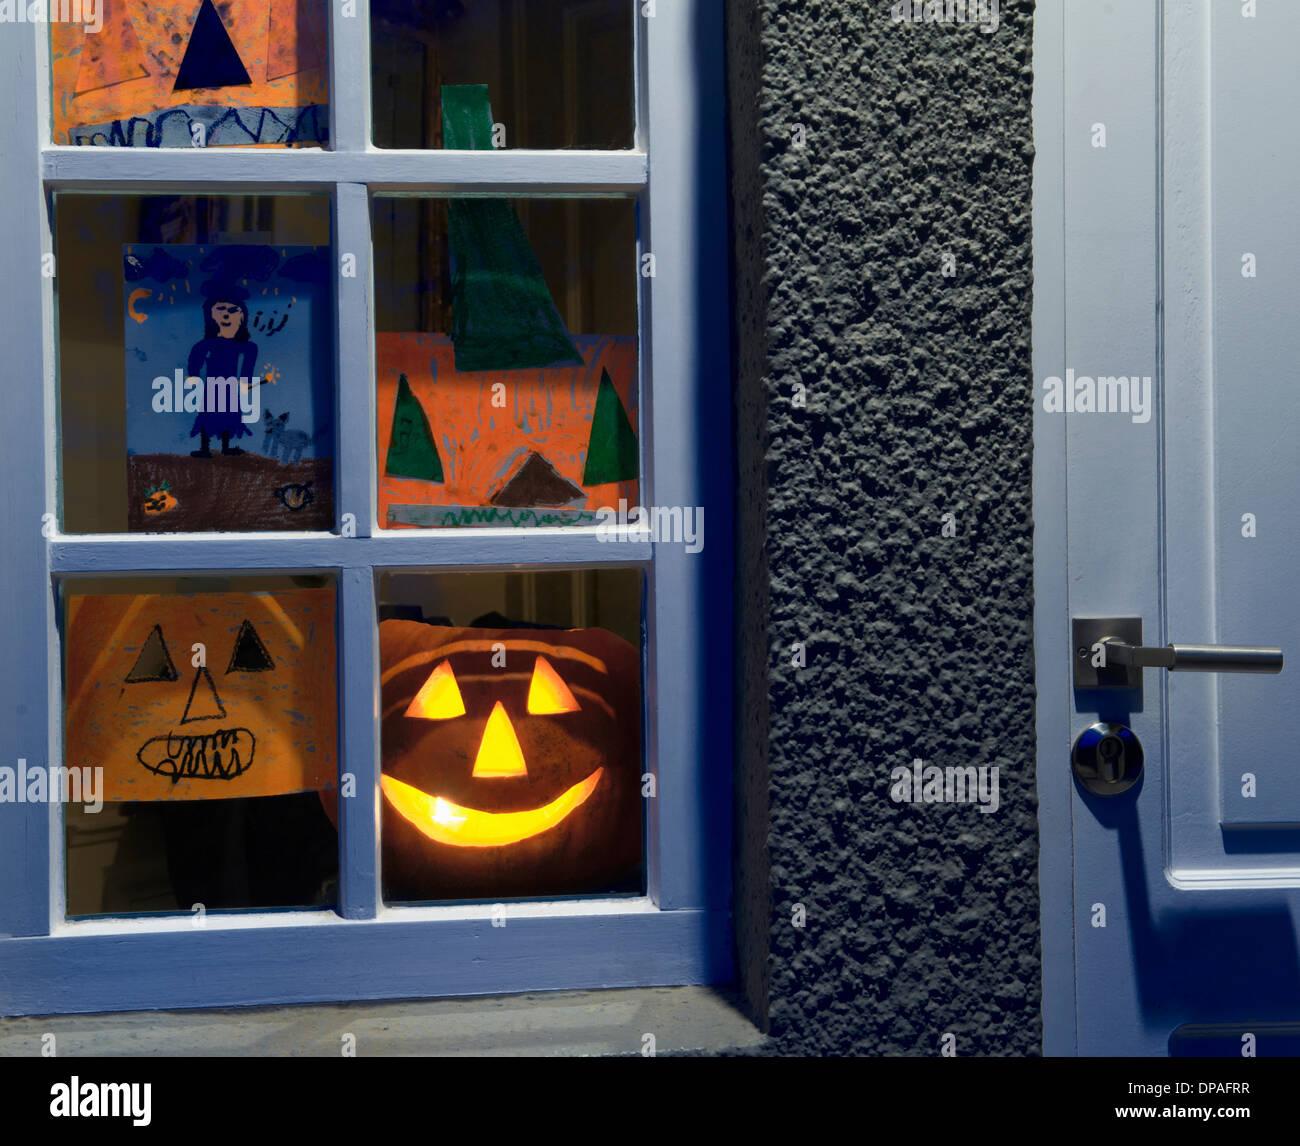 House window with halloween display - Stock Image